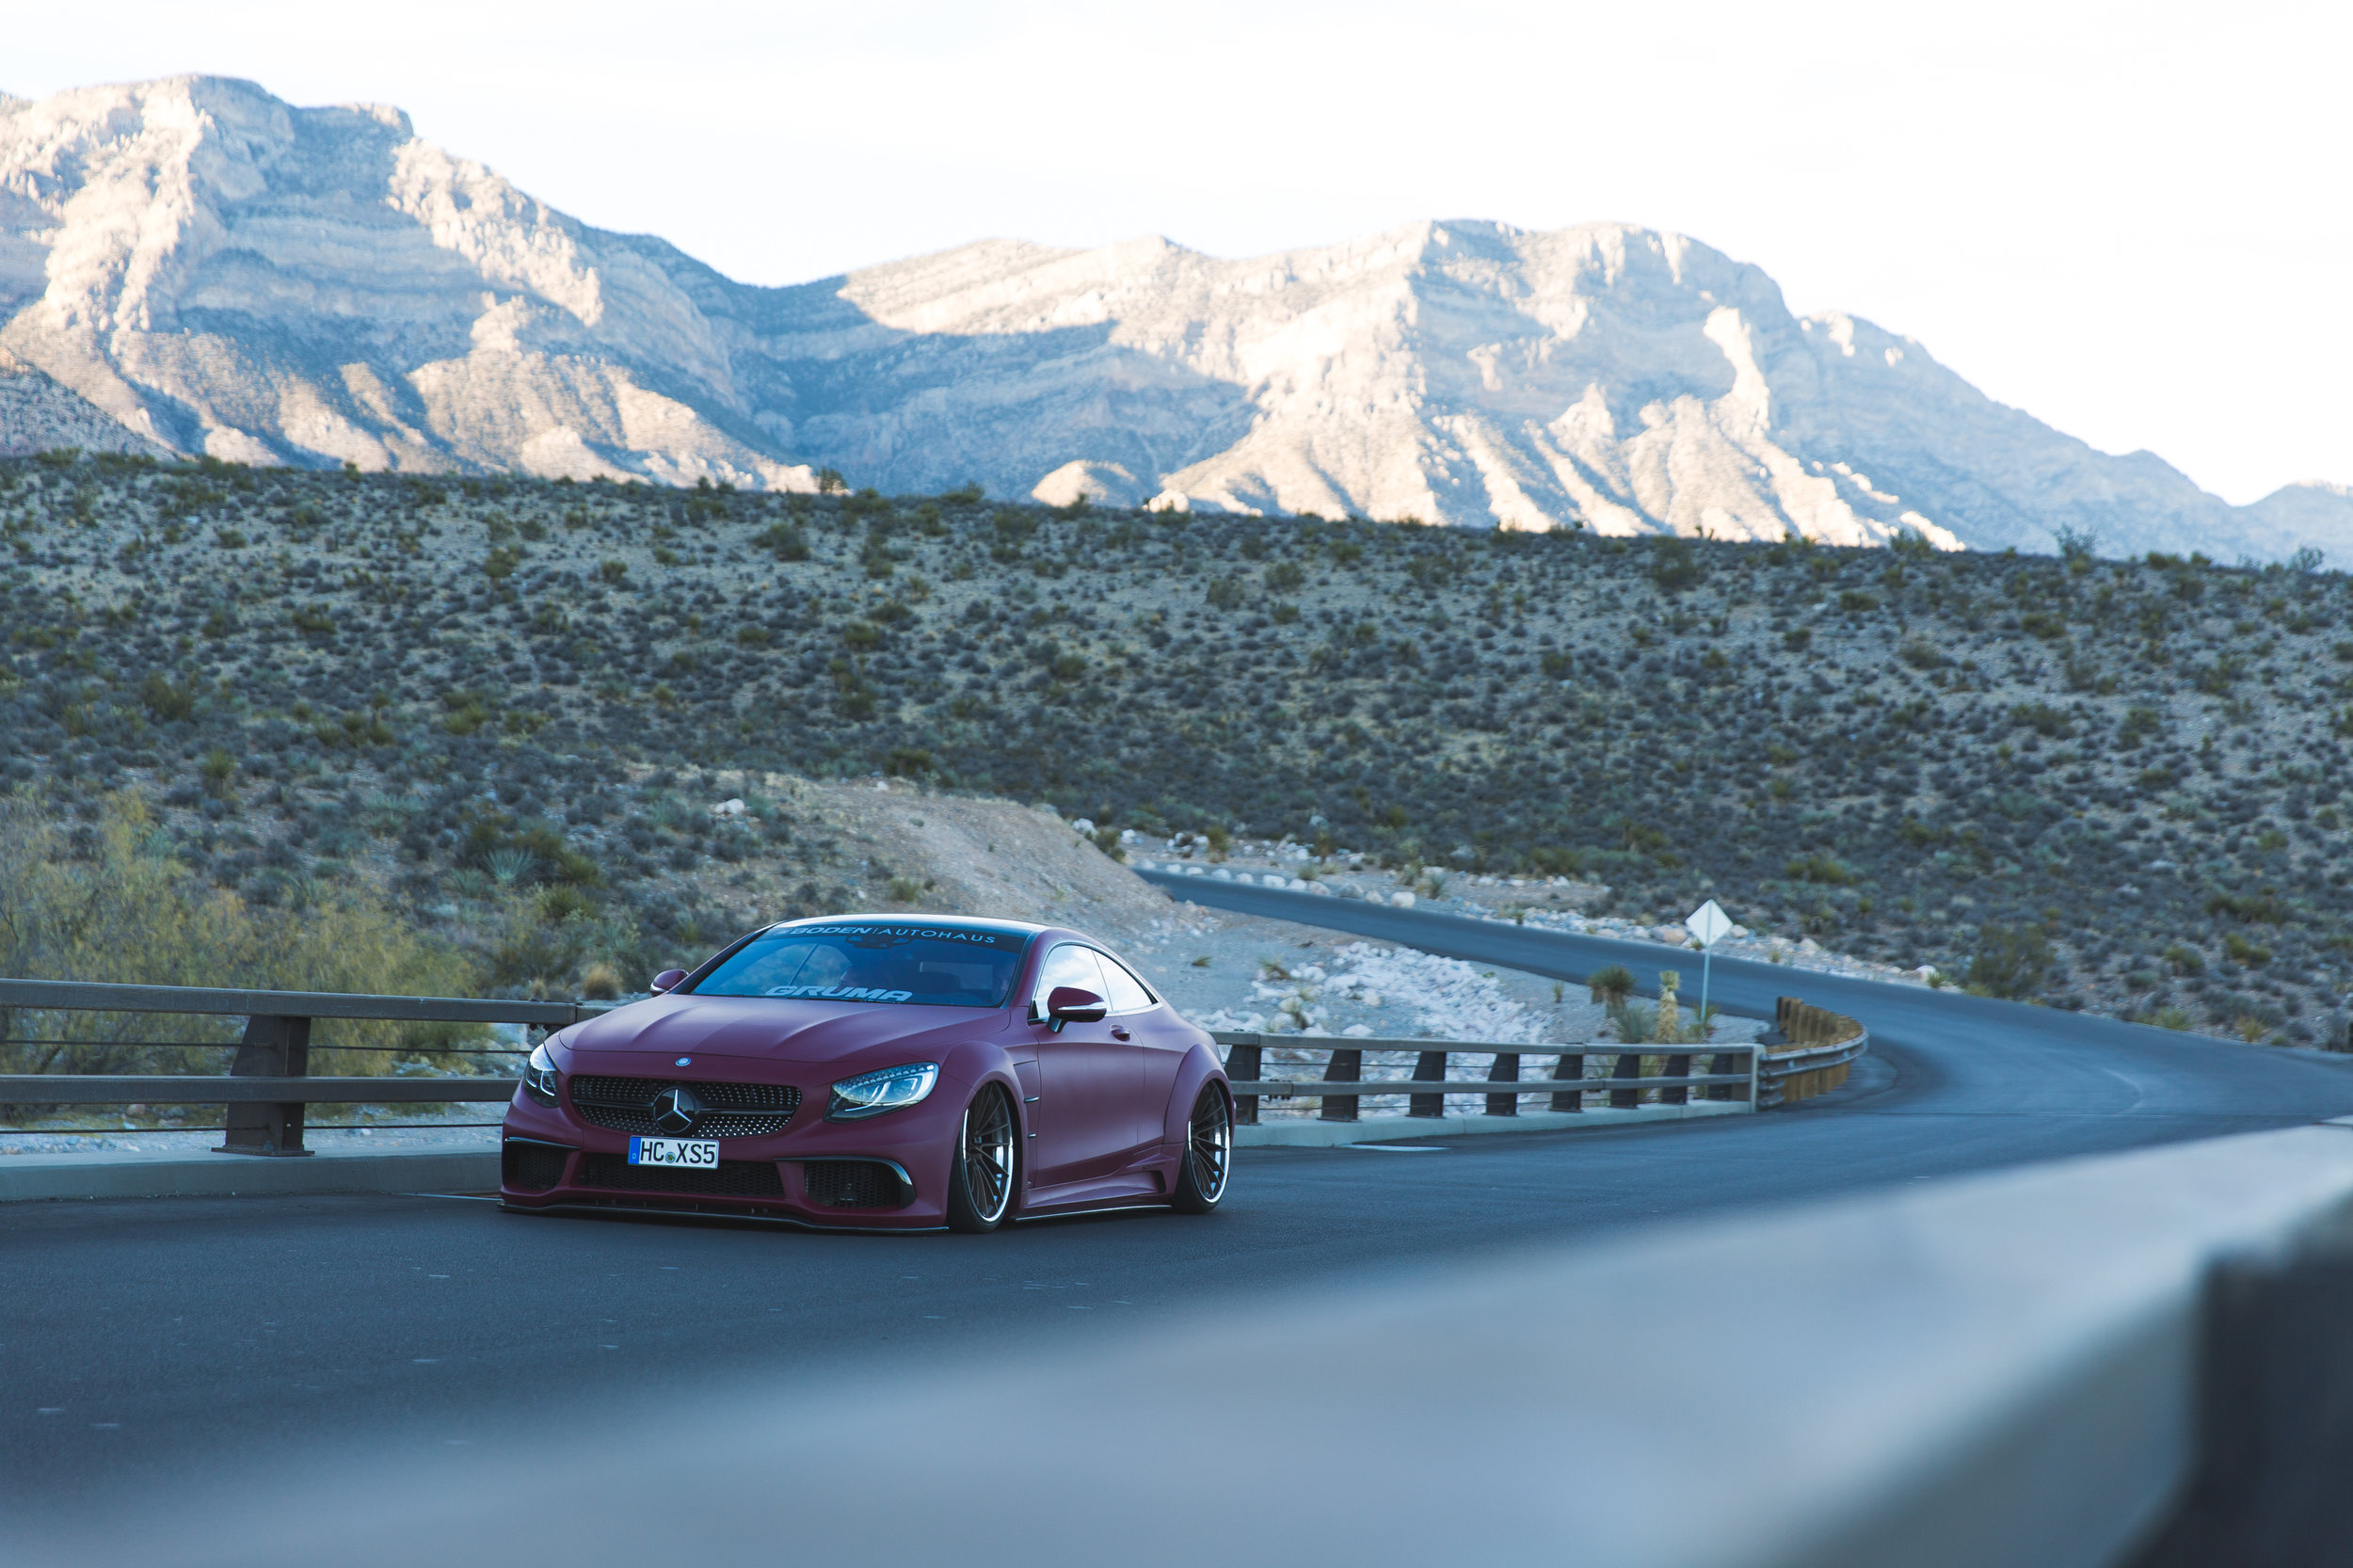 Stay_Driven_SEMA_Mercedes_S63-114.jpg